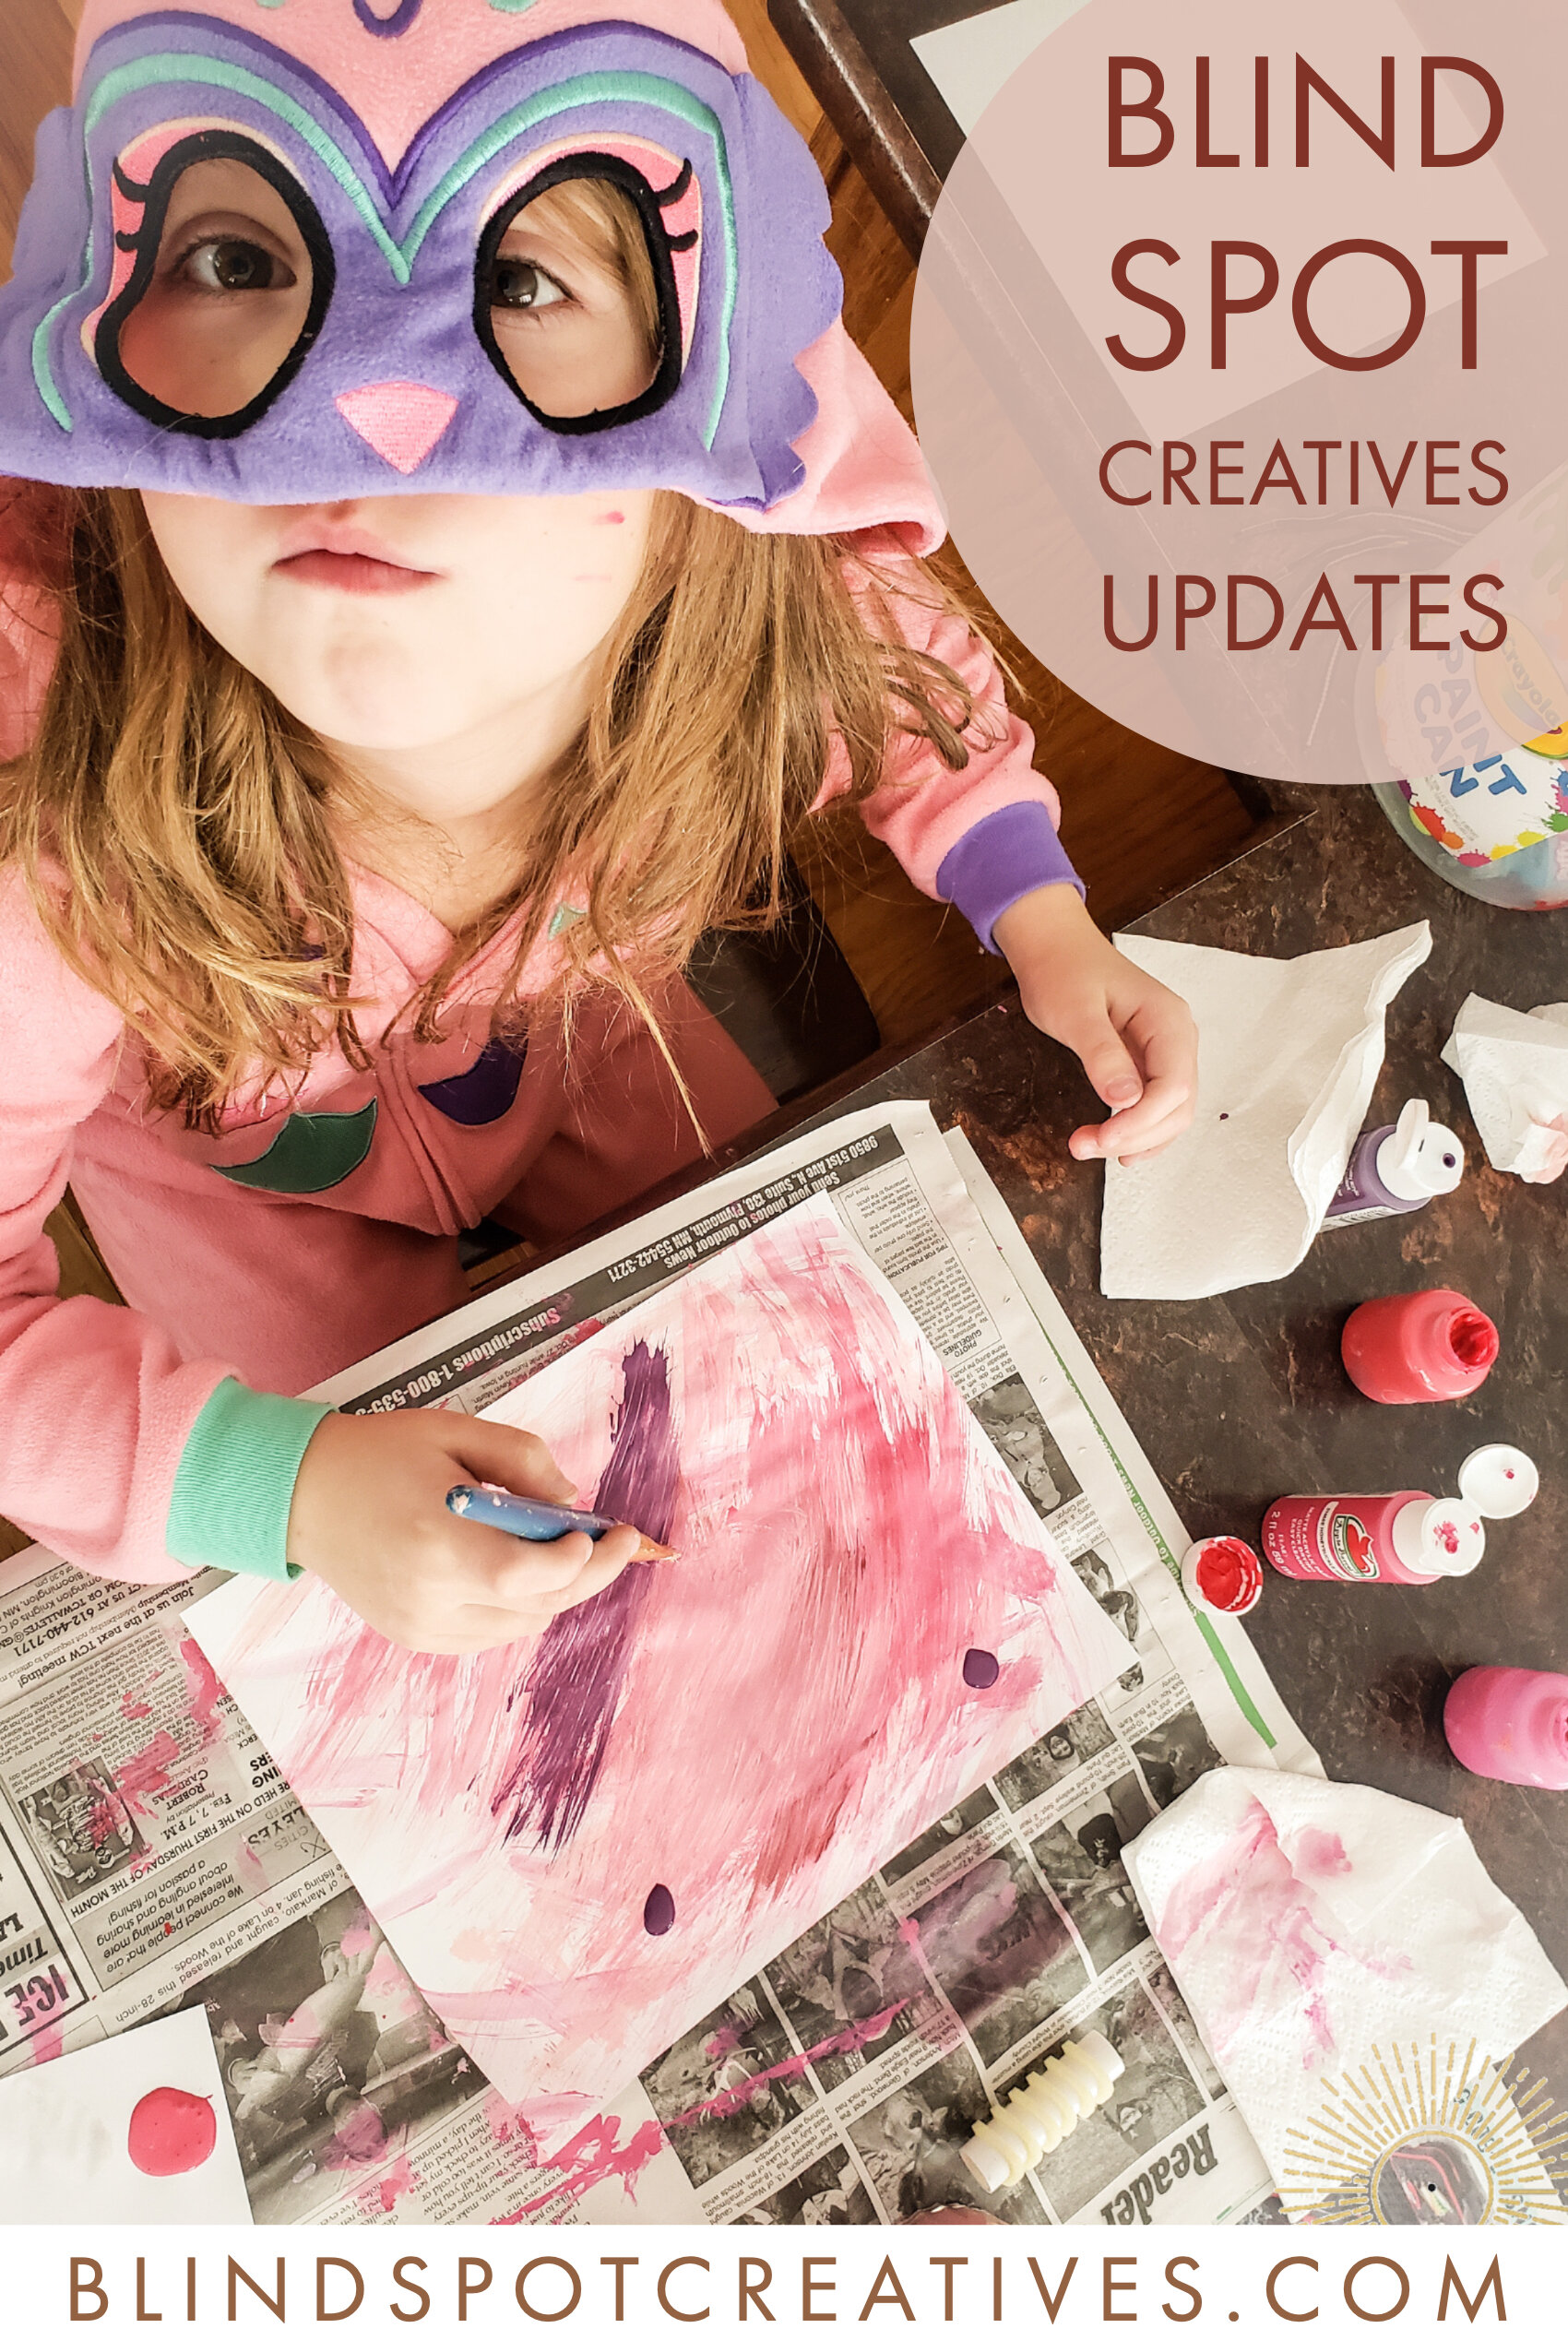 Blind Spot Creatives Updates - Avianna Painting - Duluth, Minnesota - Alyssa Johnson Photography & Writing